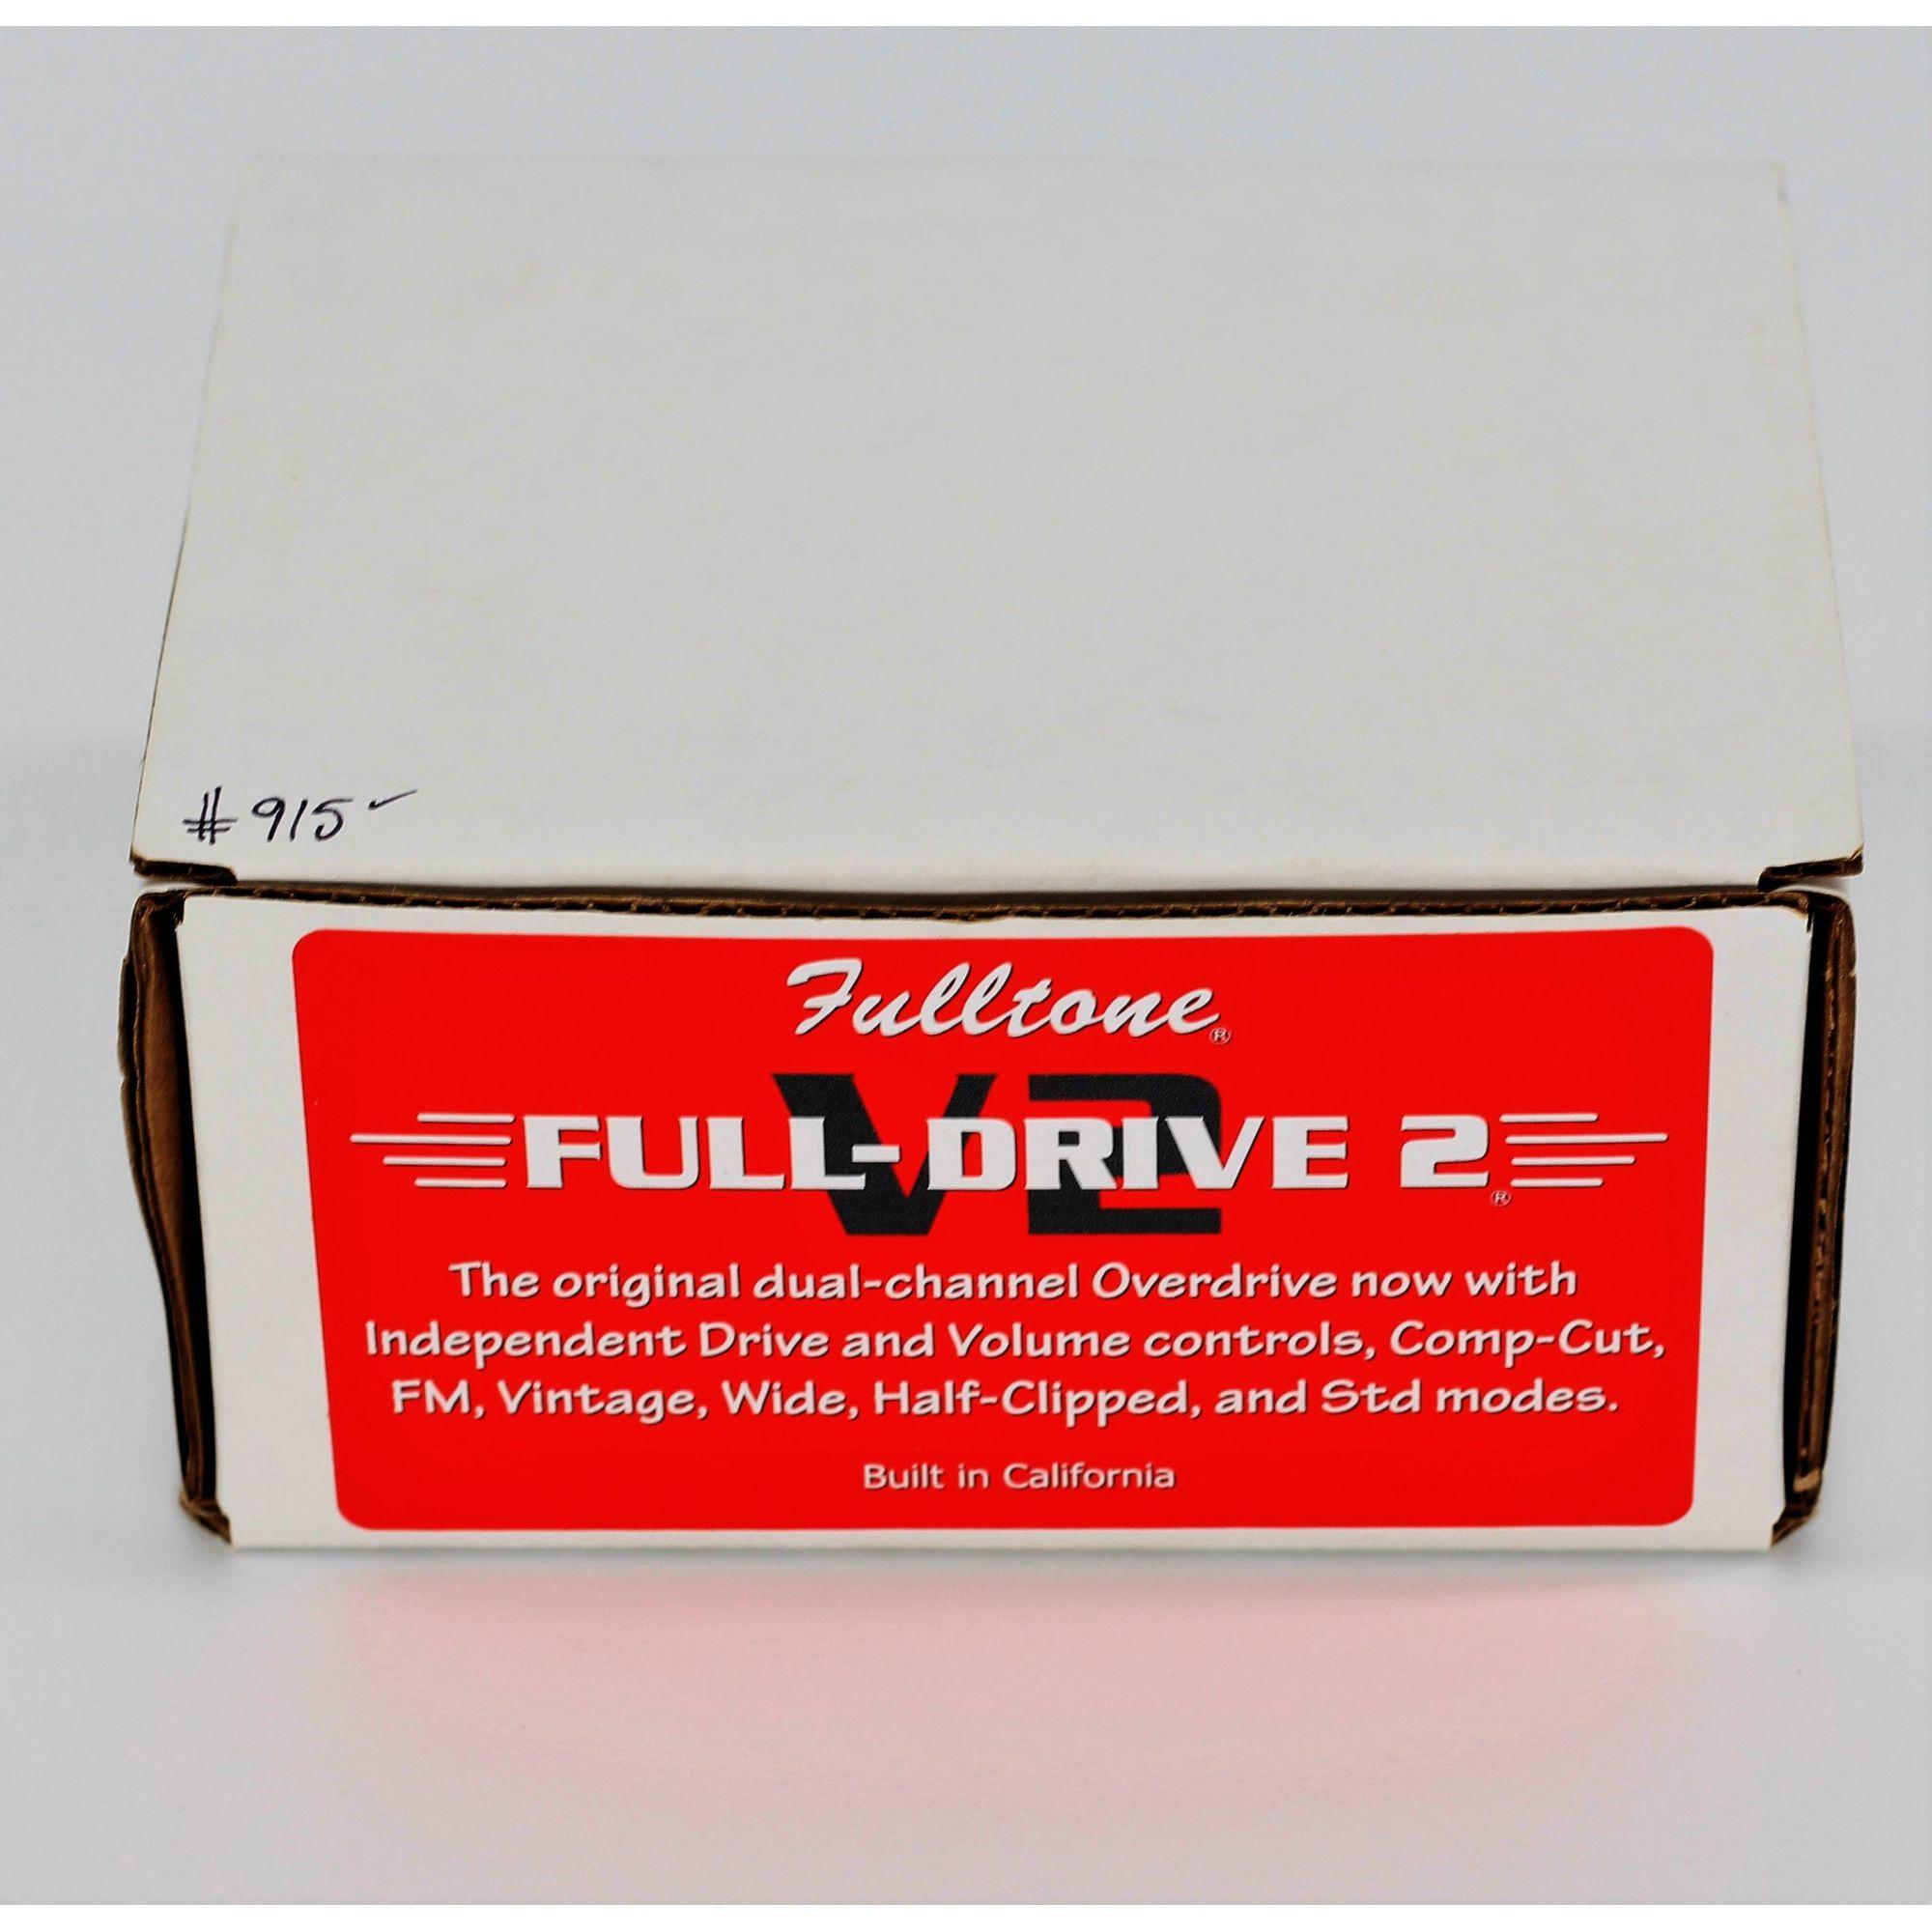 Fulltone Full-drive 2 V2 Seminovo